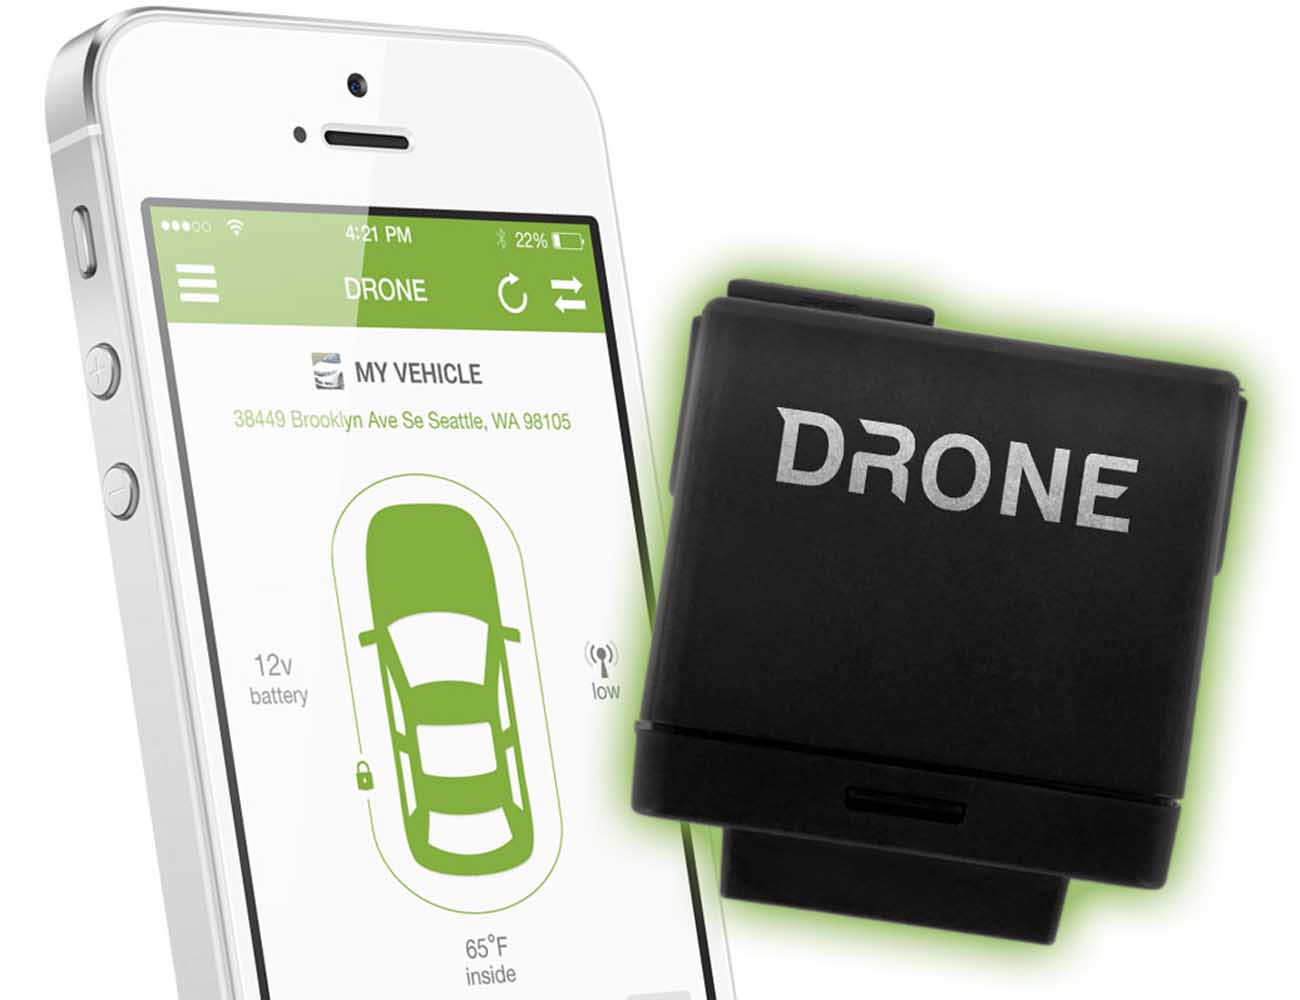 DroneMobile+%26%238211%3B+Smartphone+Remote+Start+GPS+System